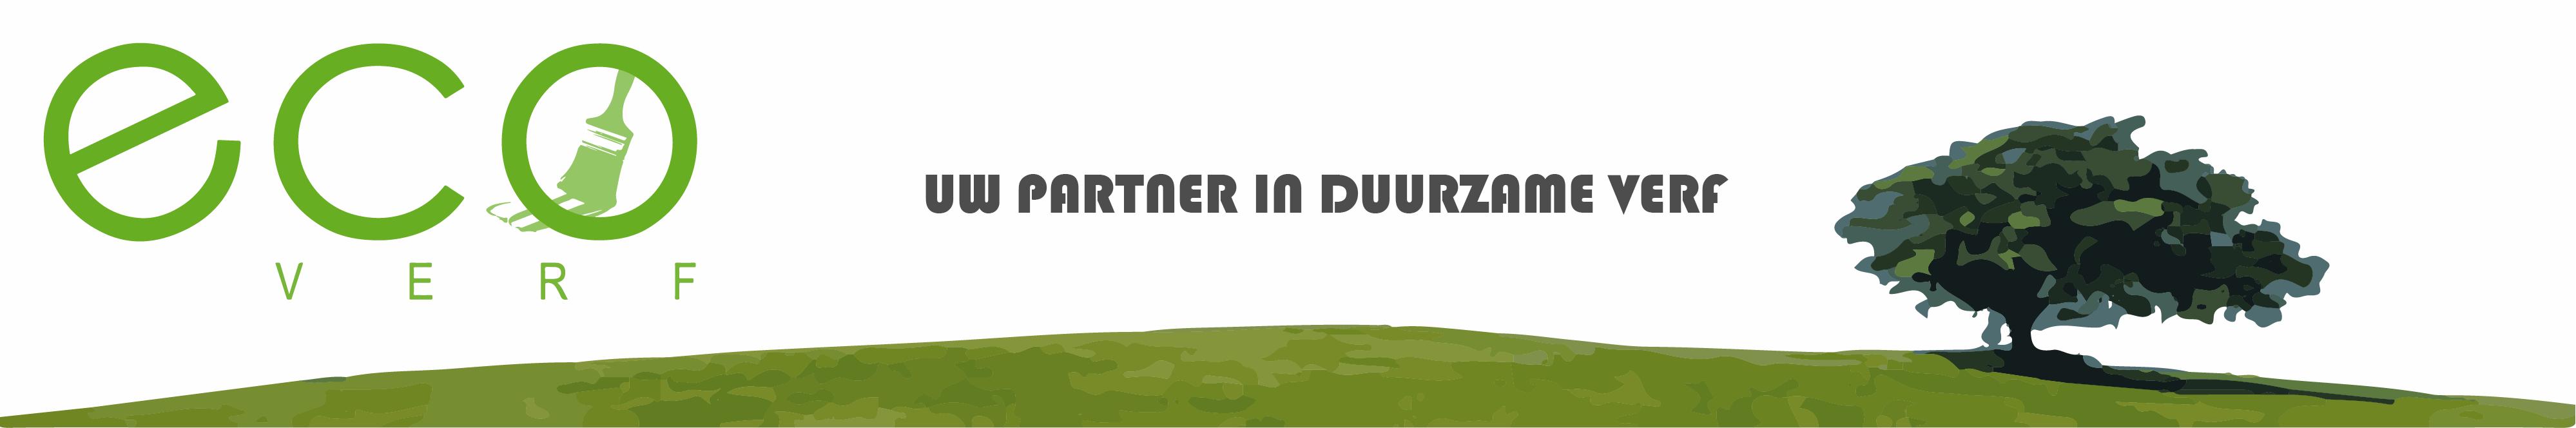 EcoVerf - Duurzame leverancier van minerale verven & natuur verven logo